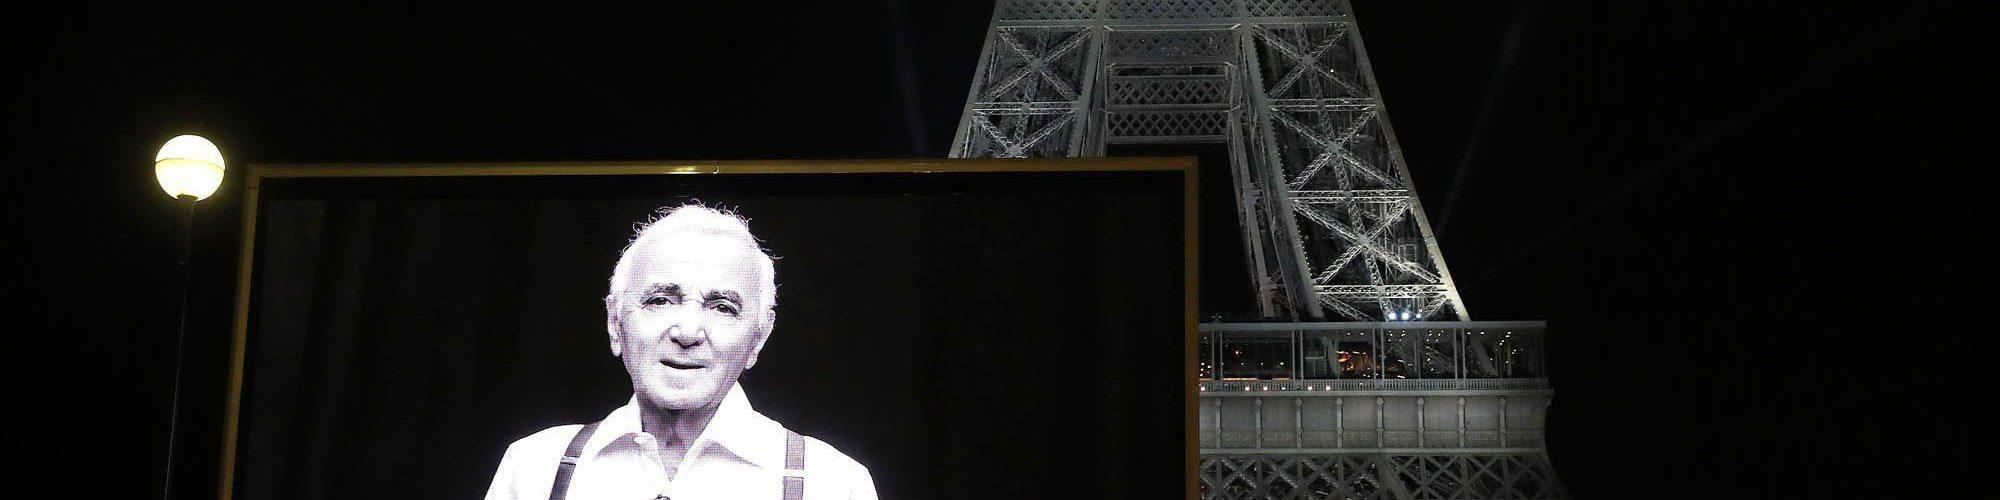 pantalla gigante LED Supervision Charles Aznavour Torre Eiffel